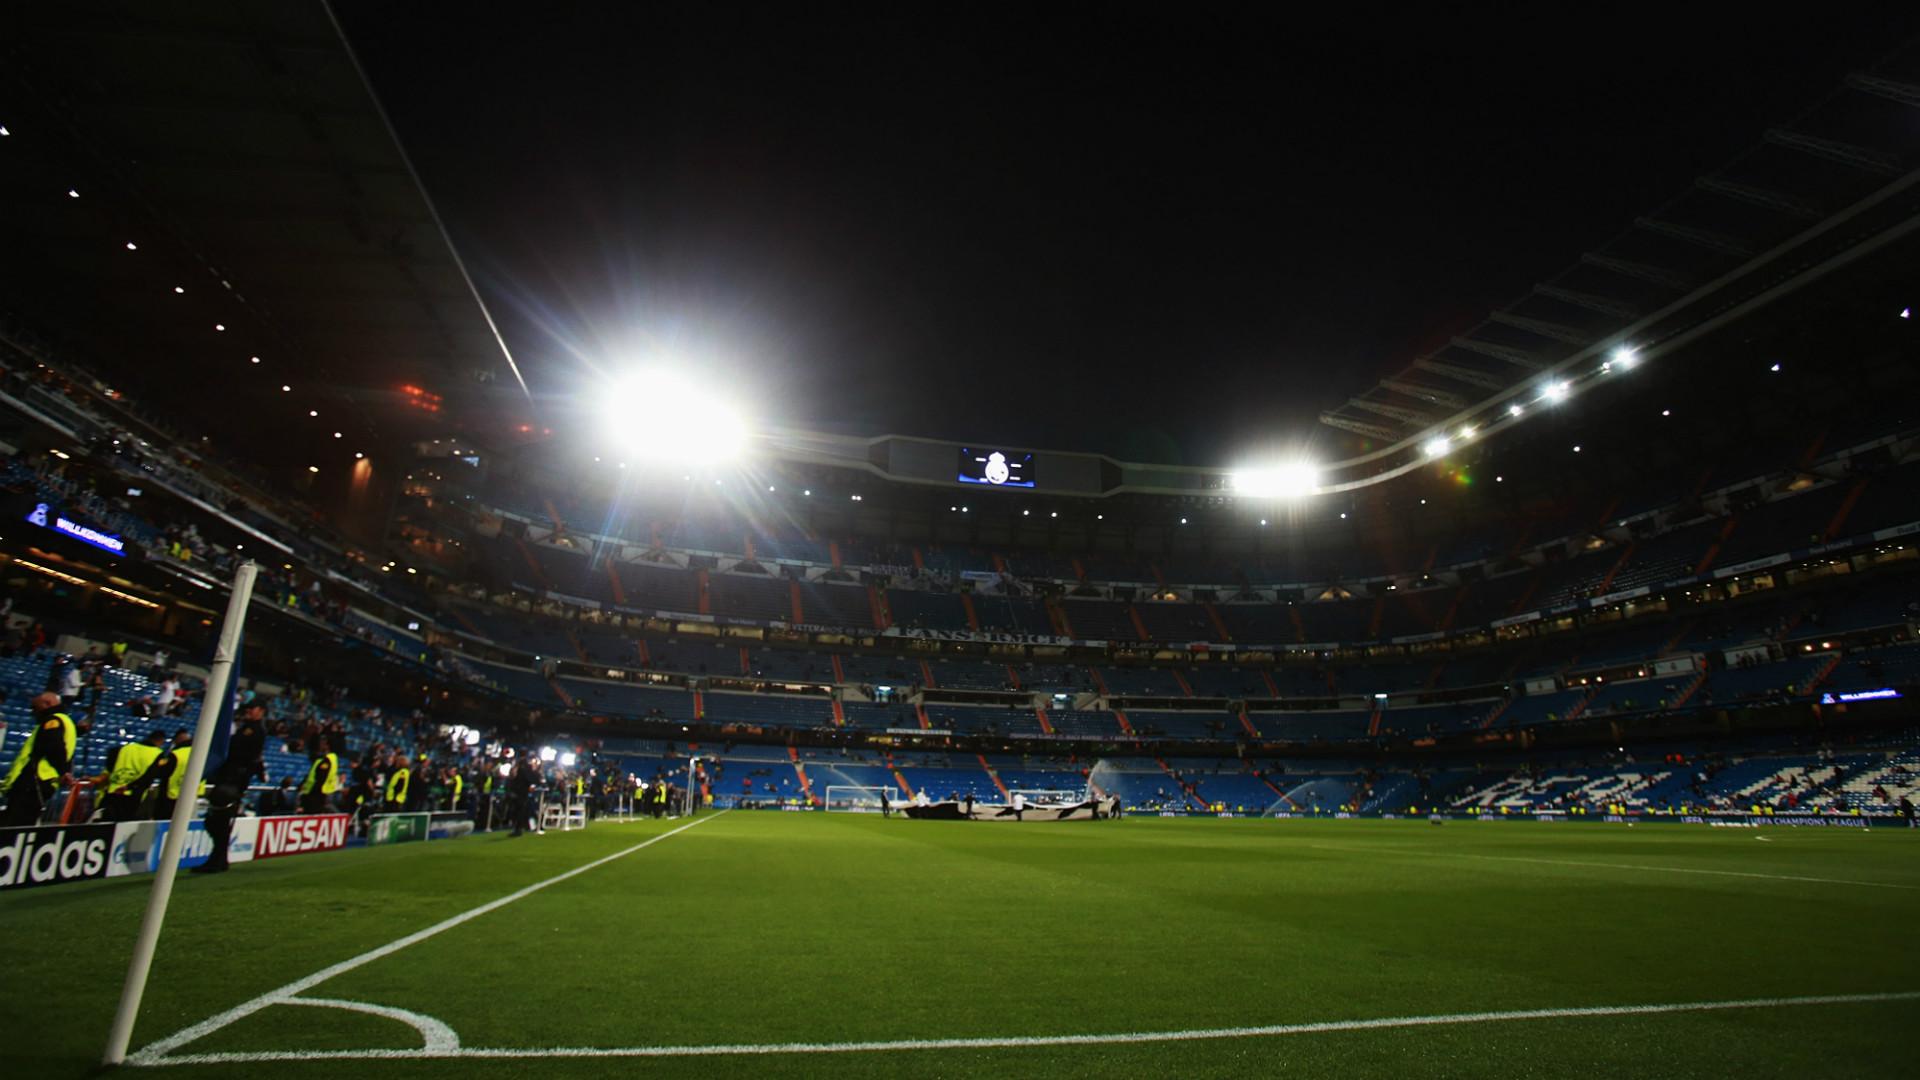 Santiago Bernabeu Stadium Real Madrid Spain 03102015